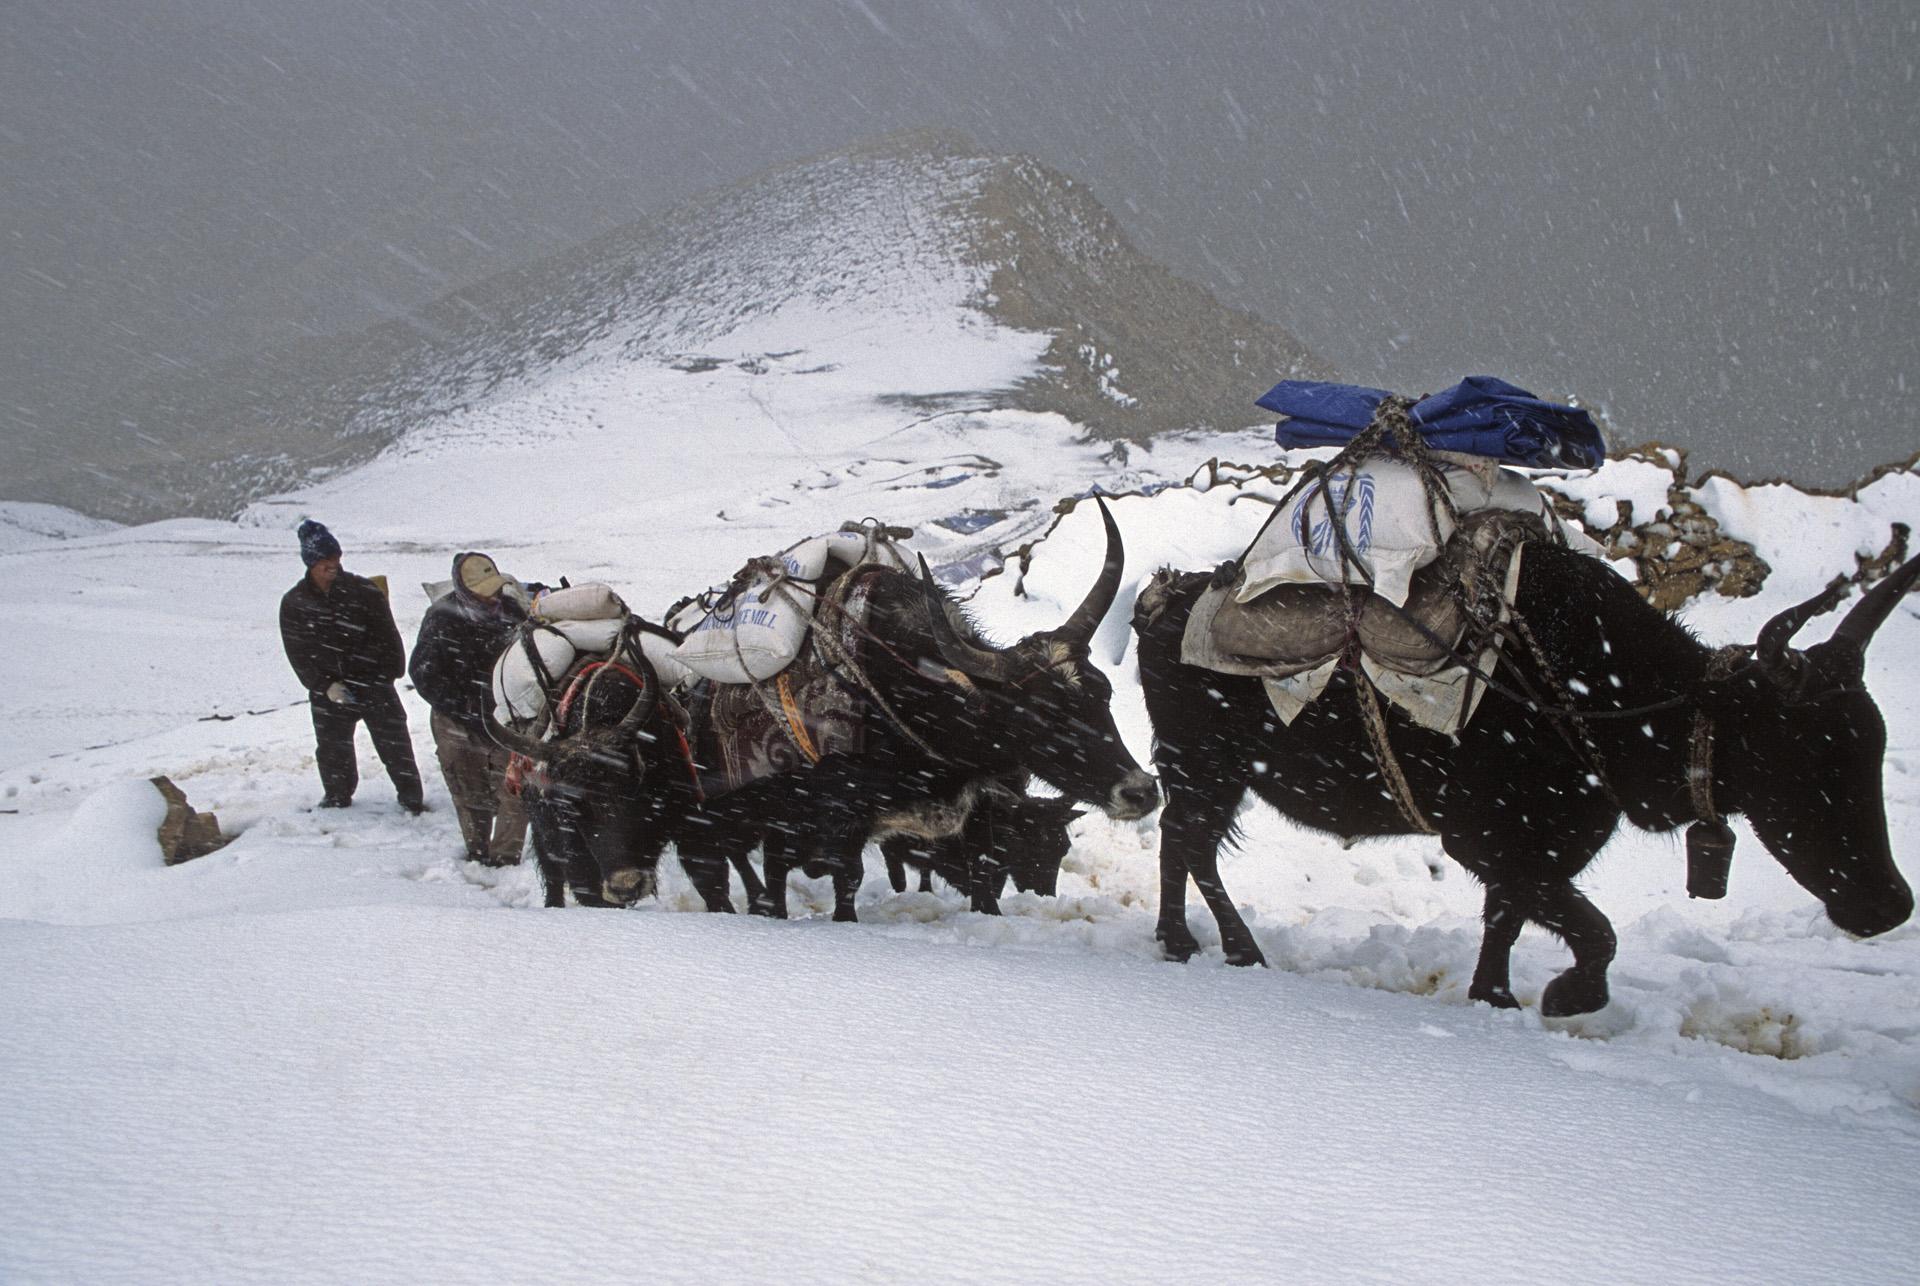 Nara La Pass 4,507m and the caravan of yaks returning from Tibet.